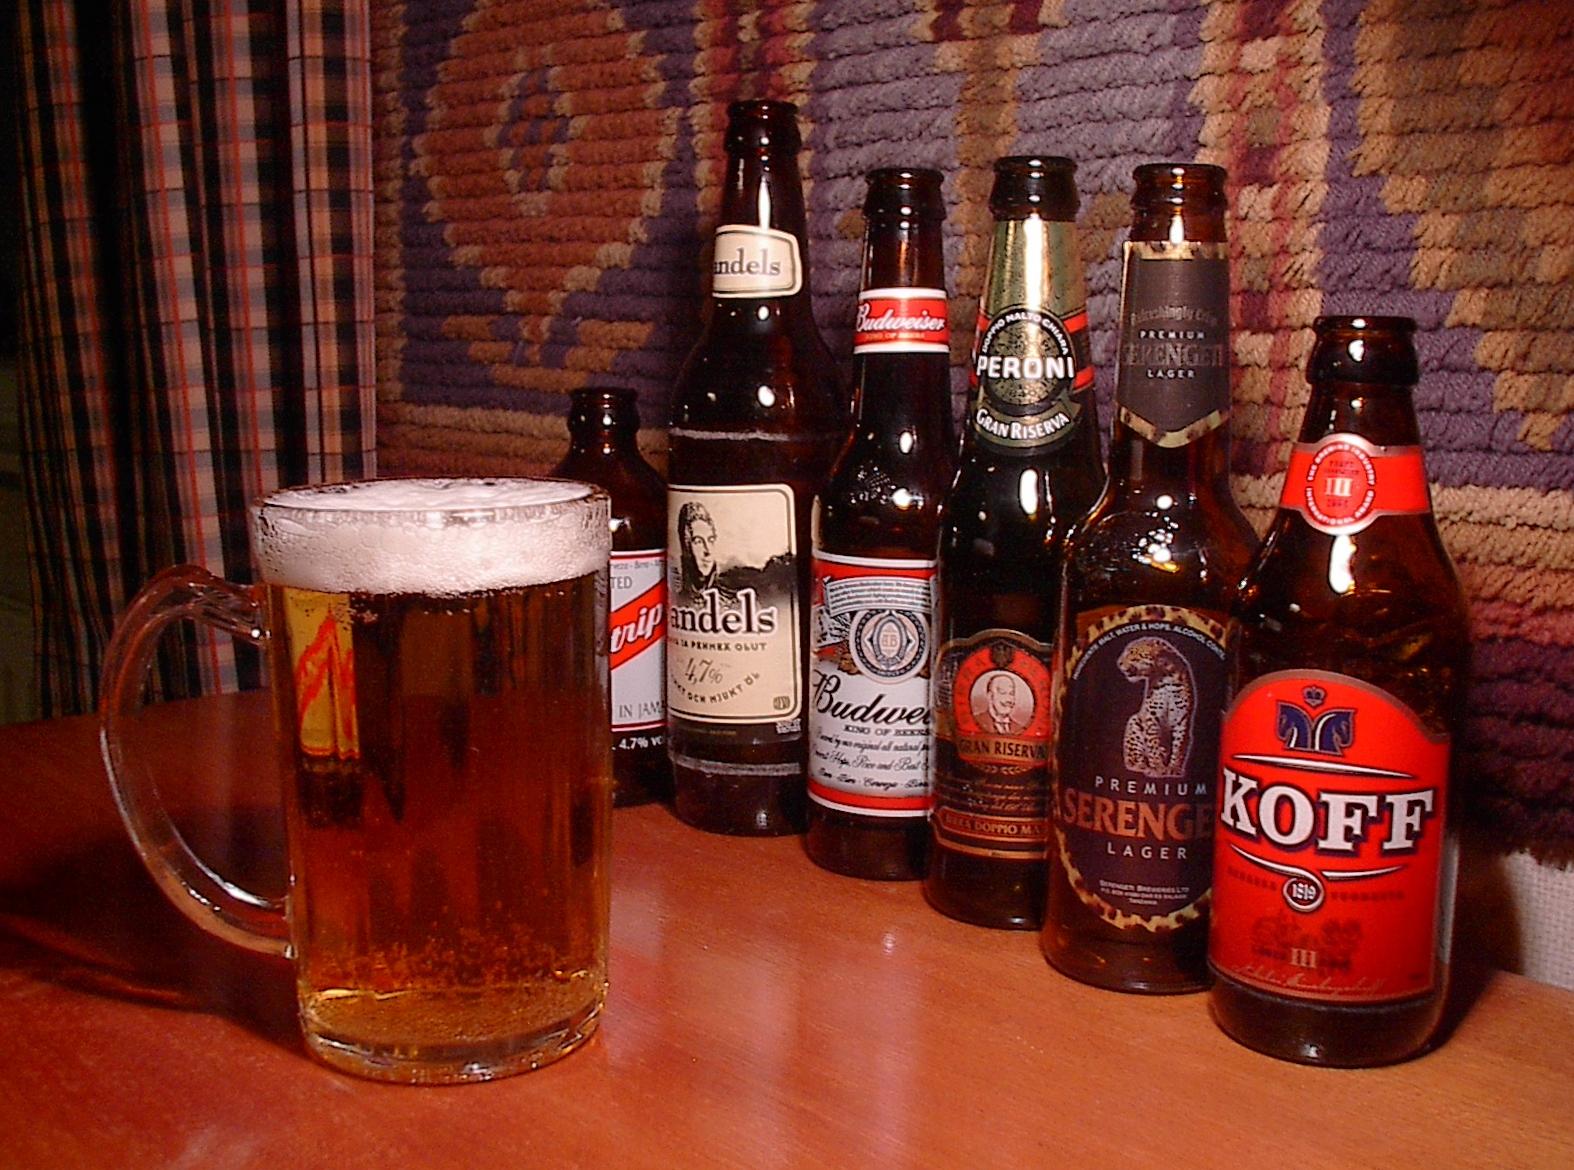 preview of budweiser beer fkirnm hd wallpaper background 24554 1574x1170